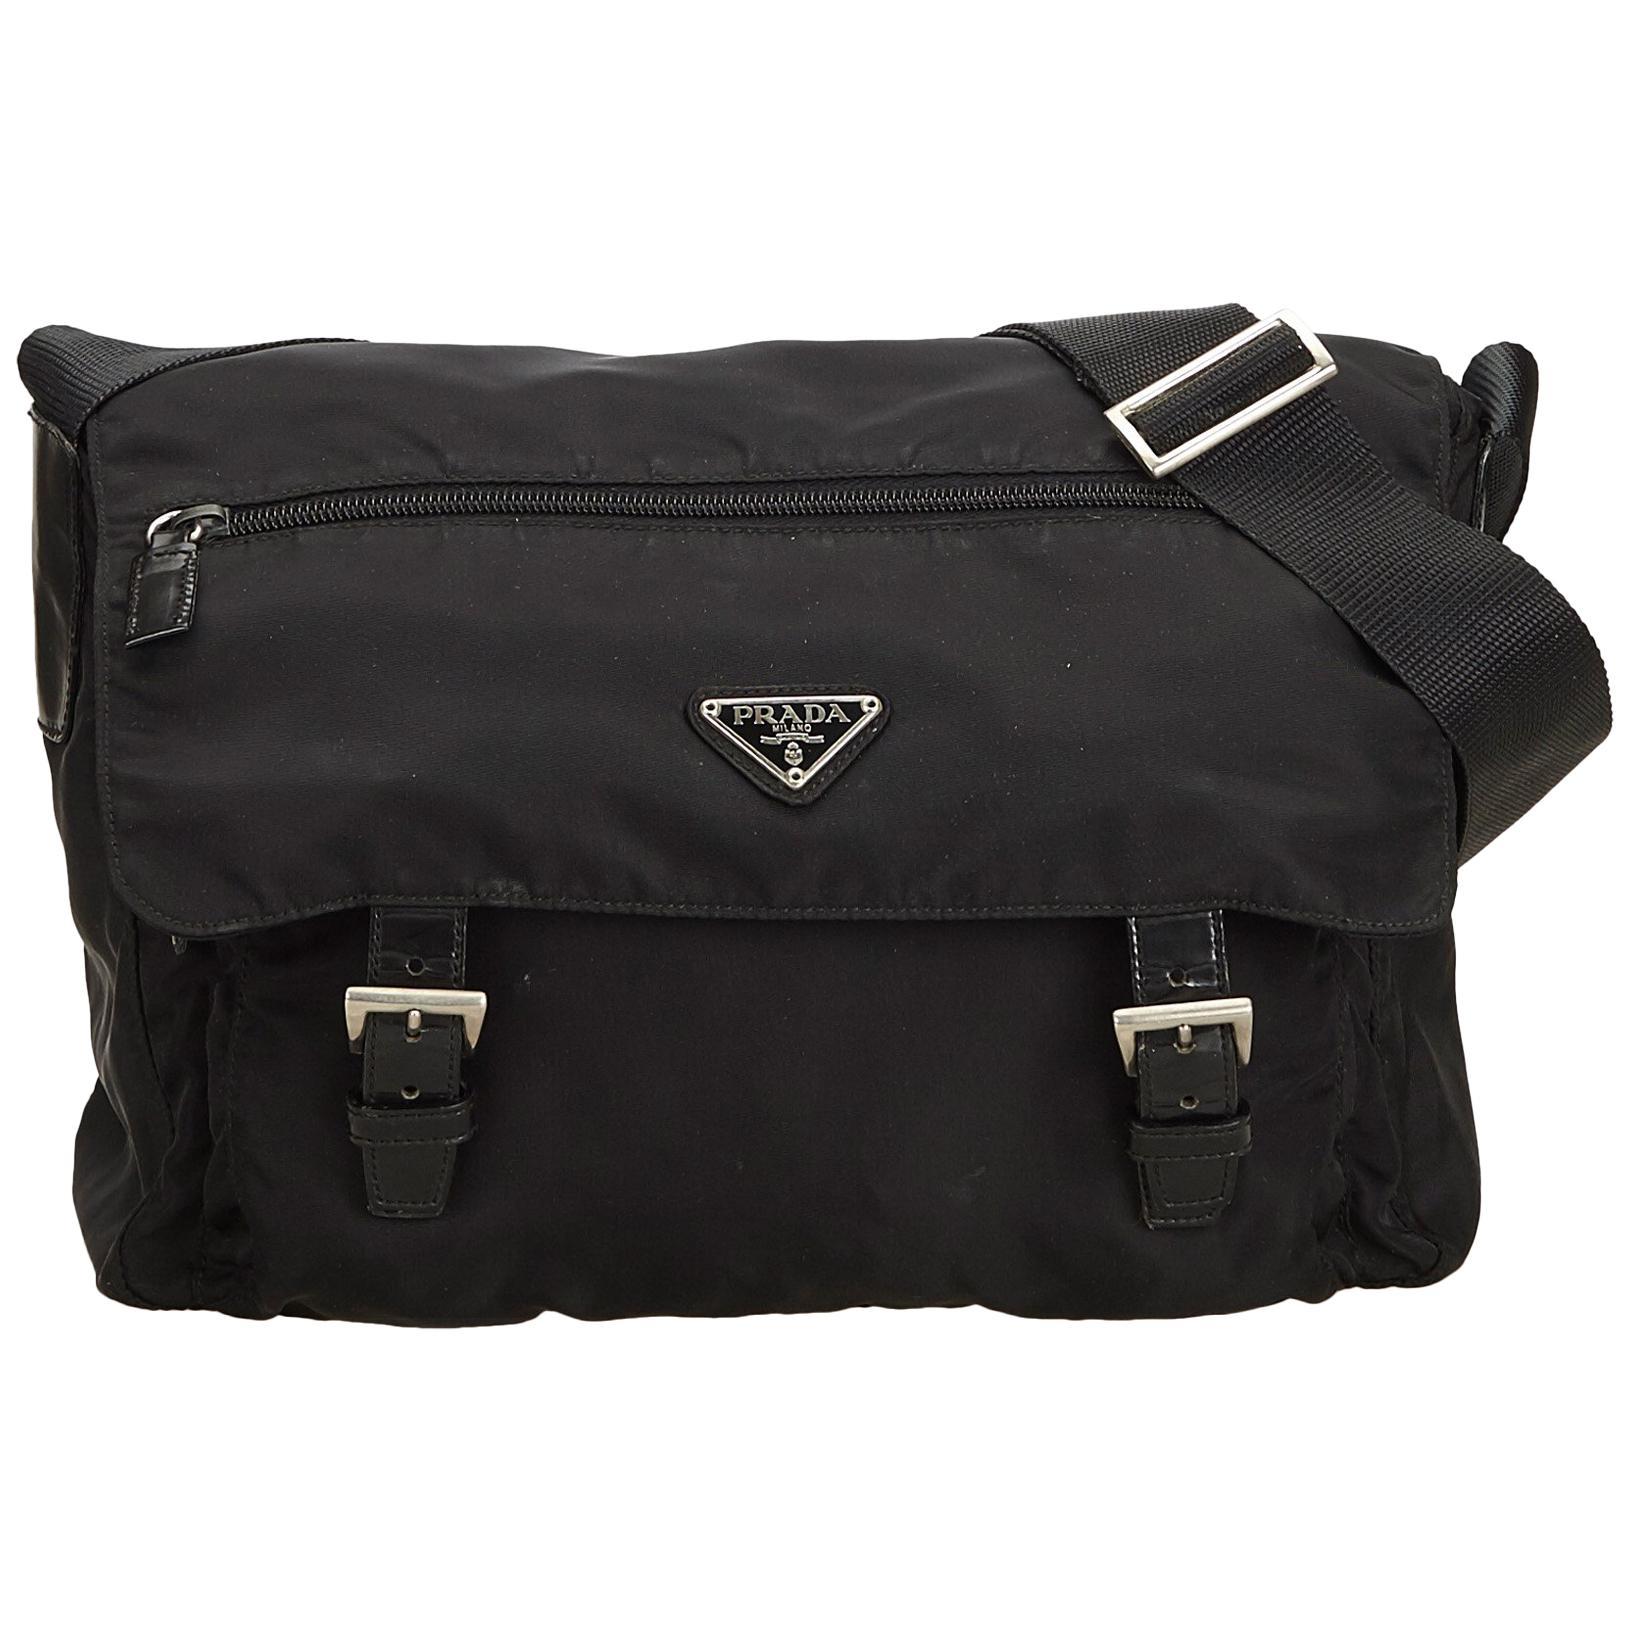 63742b58d2e ... release date prada black tessuto nylon messenger bag for sale 70cd2  edb34 authentic prada tessuto messenger bag tessuto nylon lxrandco pre  owned luxury ...